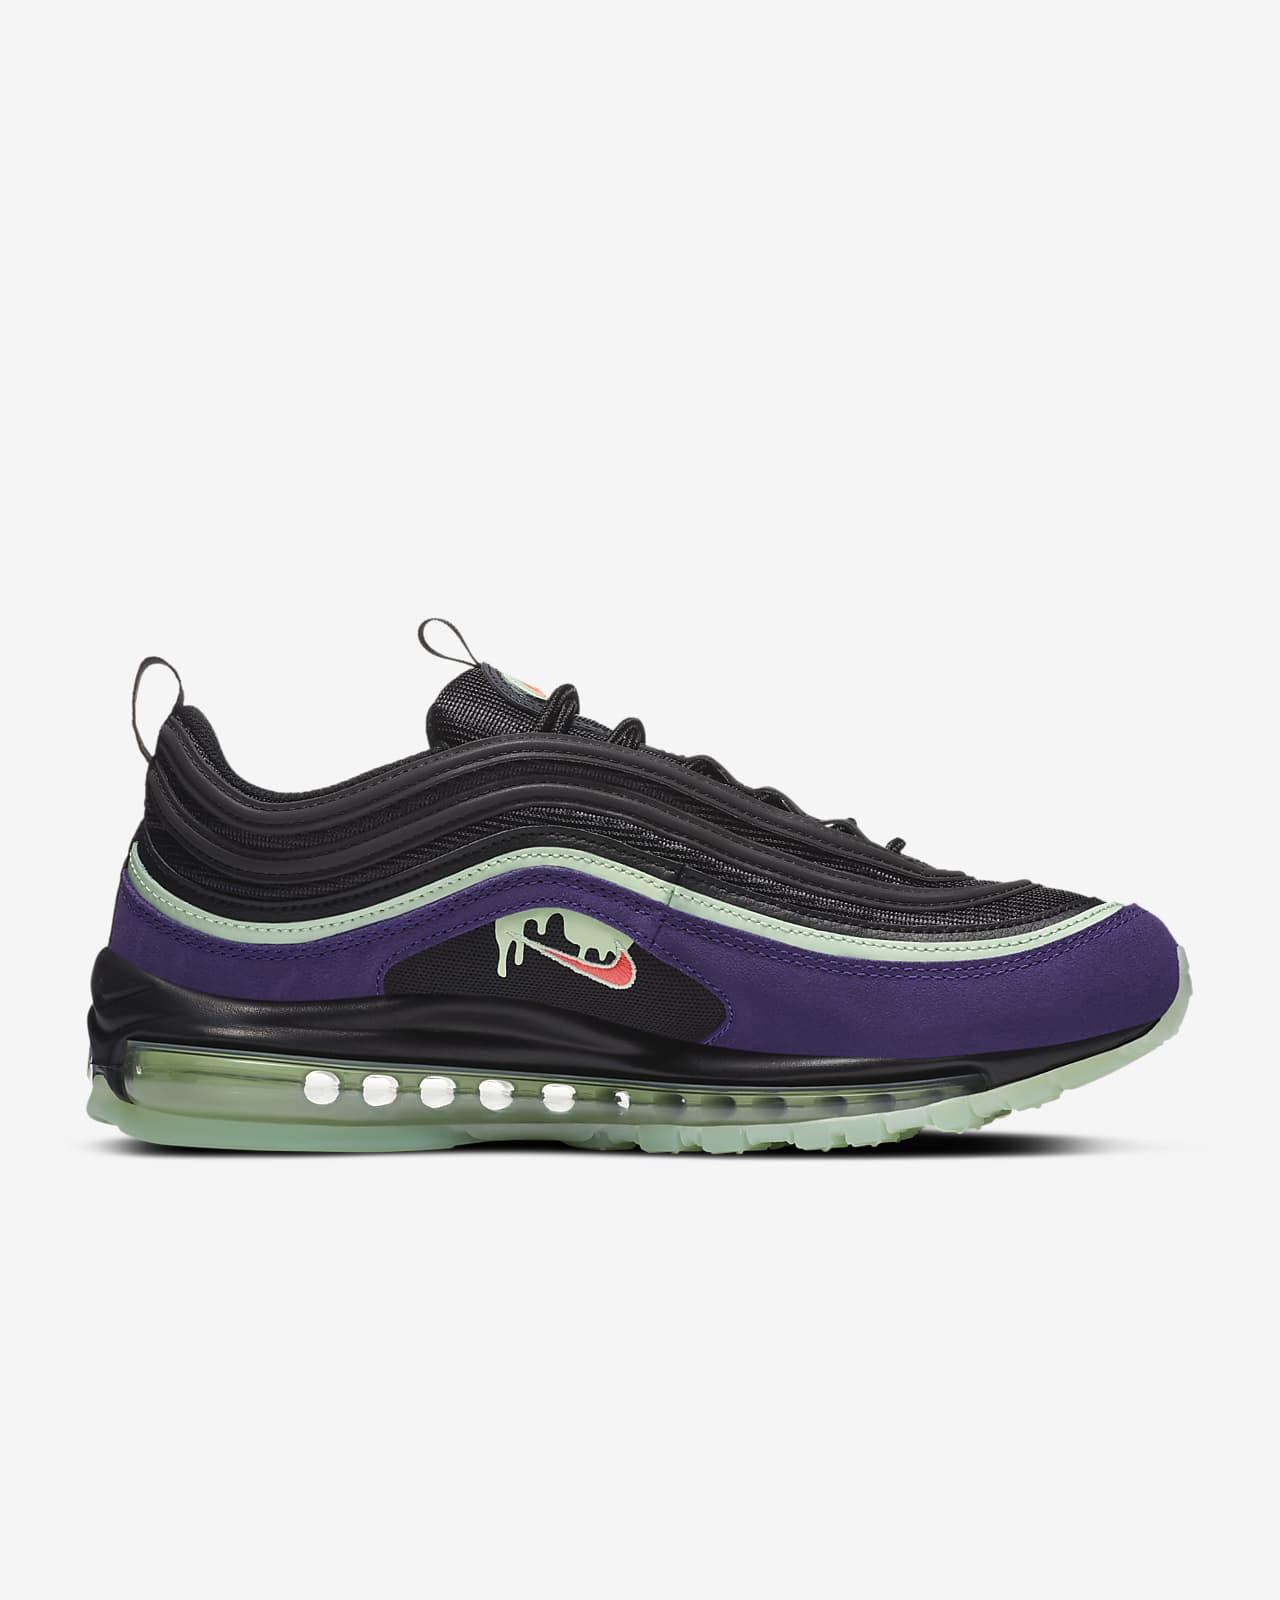 nike 97 purple and black